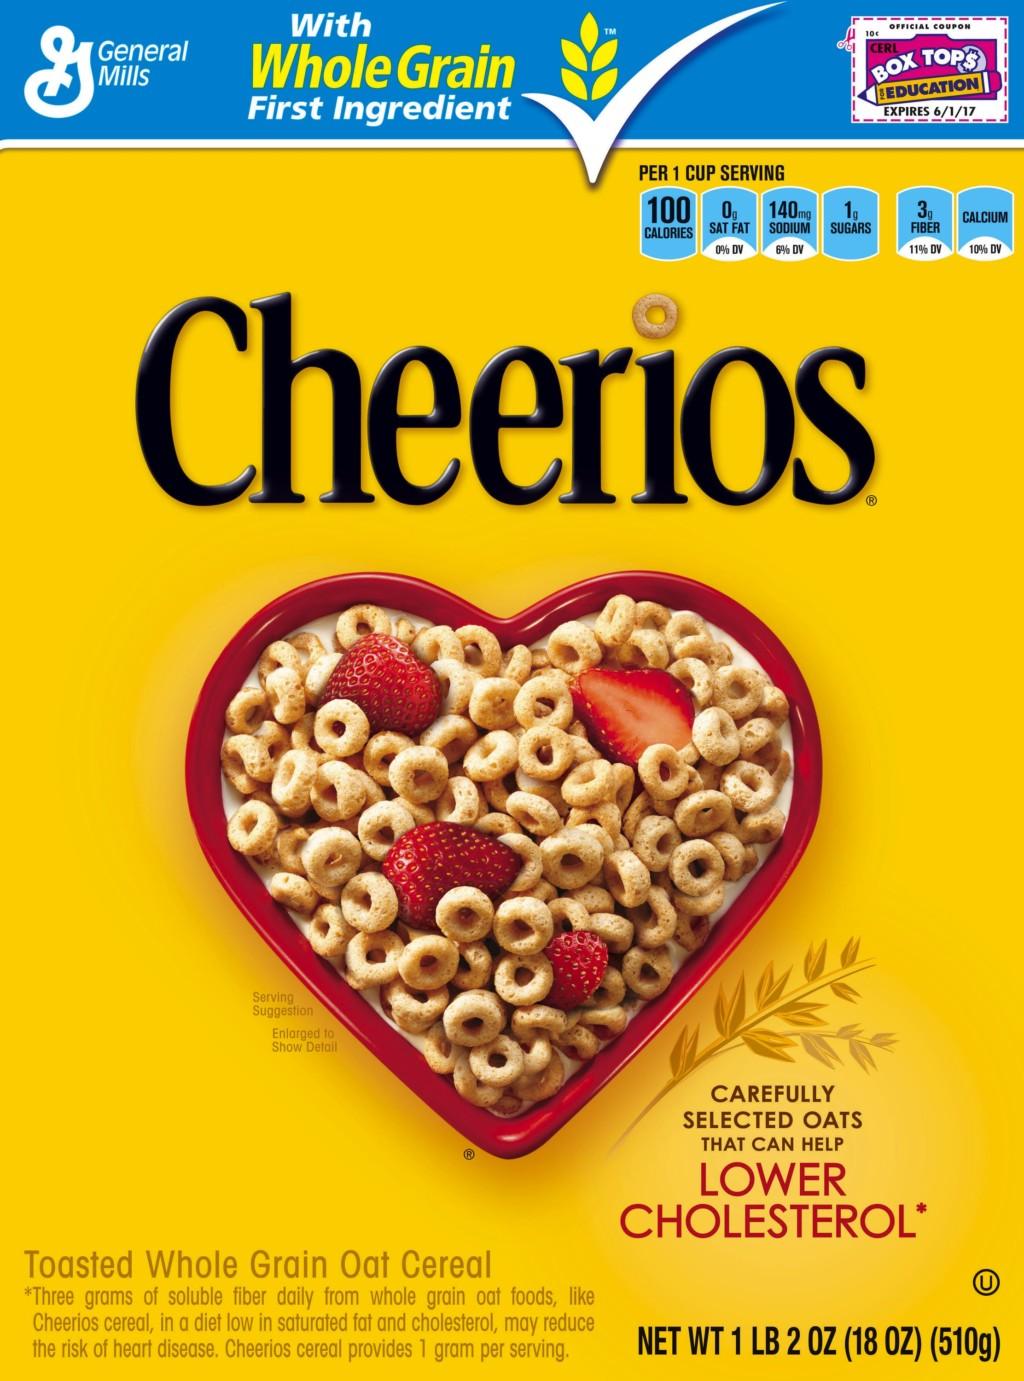 Box Tops 4 Education - Cheerios